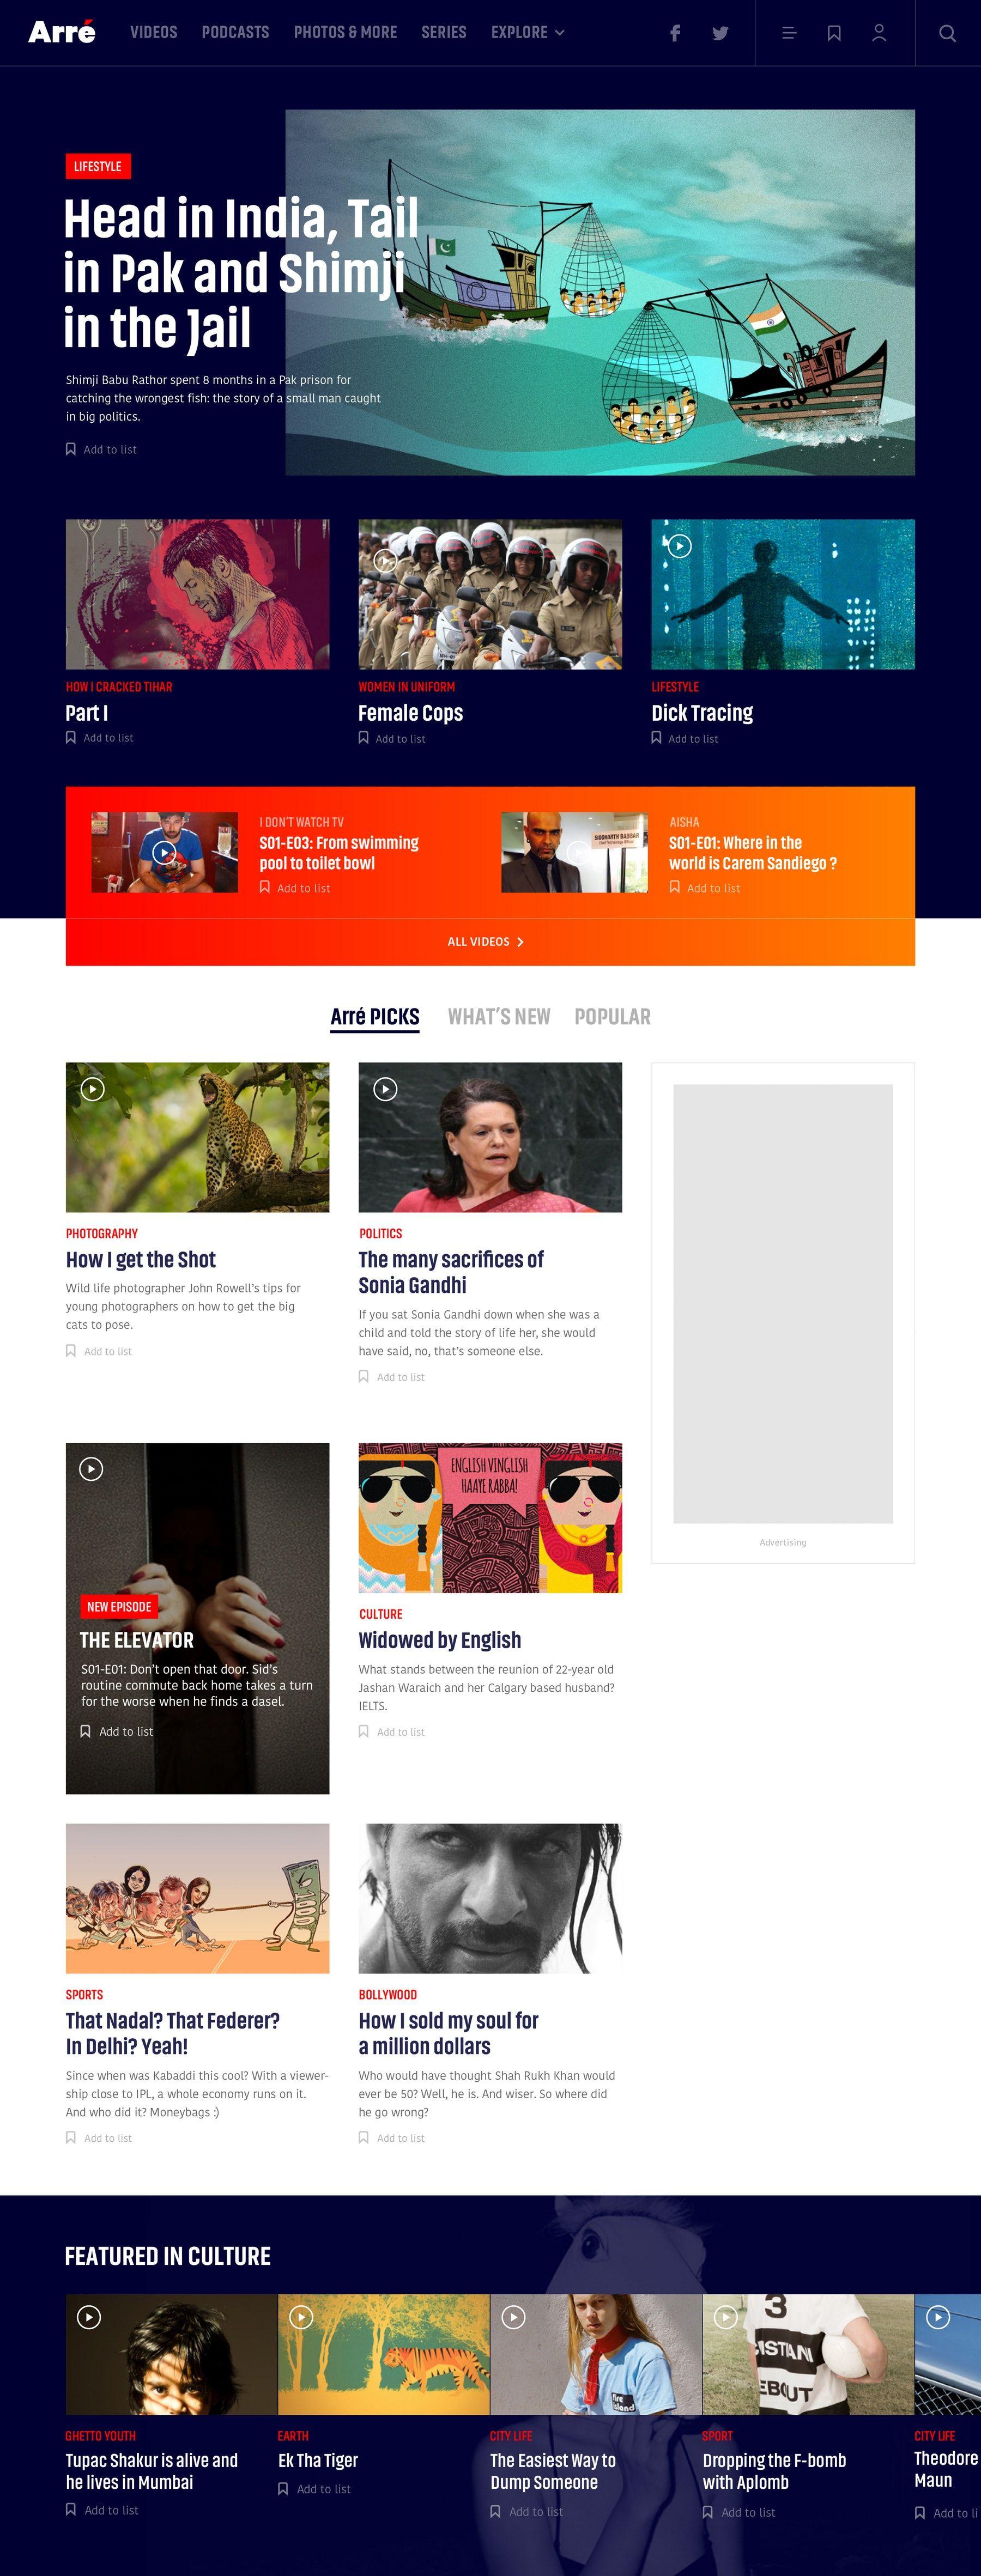 Pin By Jenifer Bulcock On Web Design News Web Design Website Design Web Design Trends